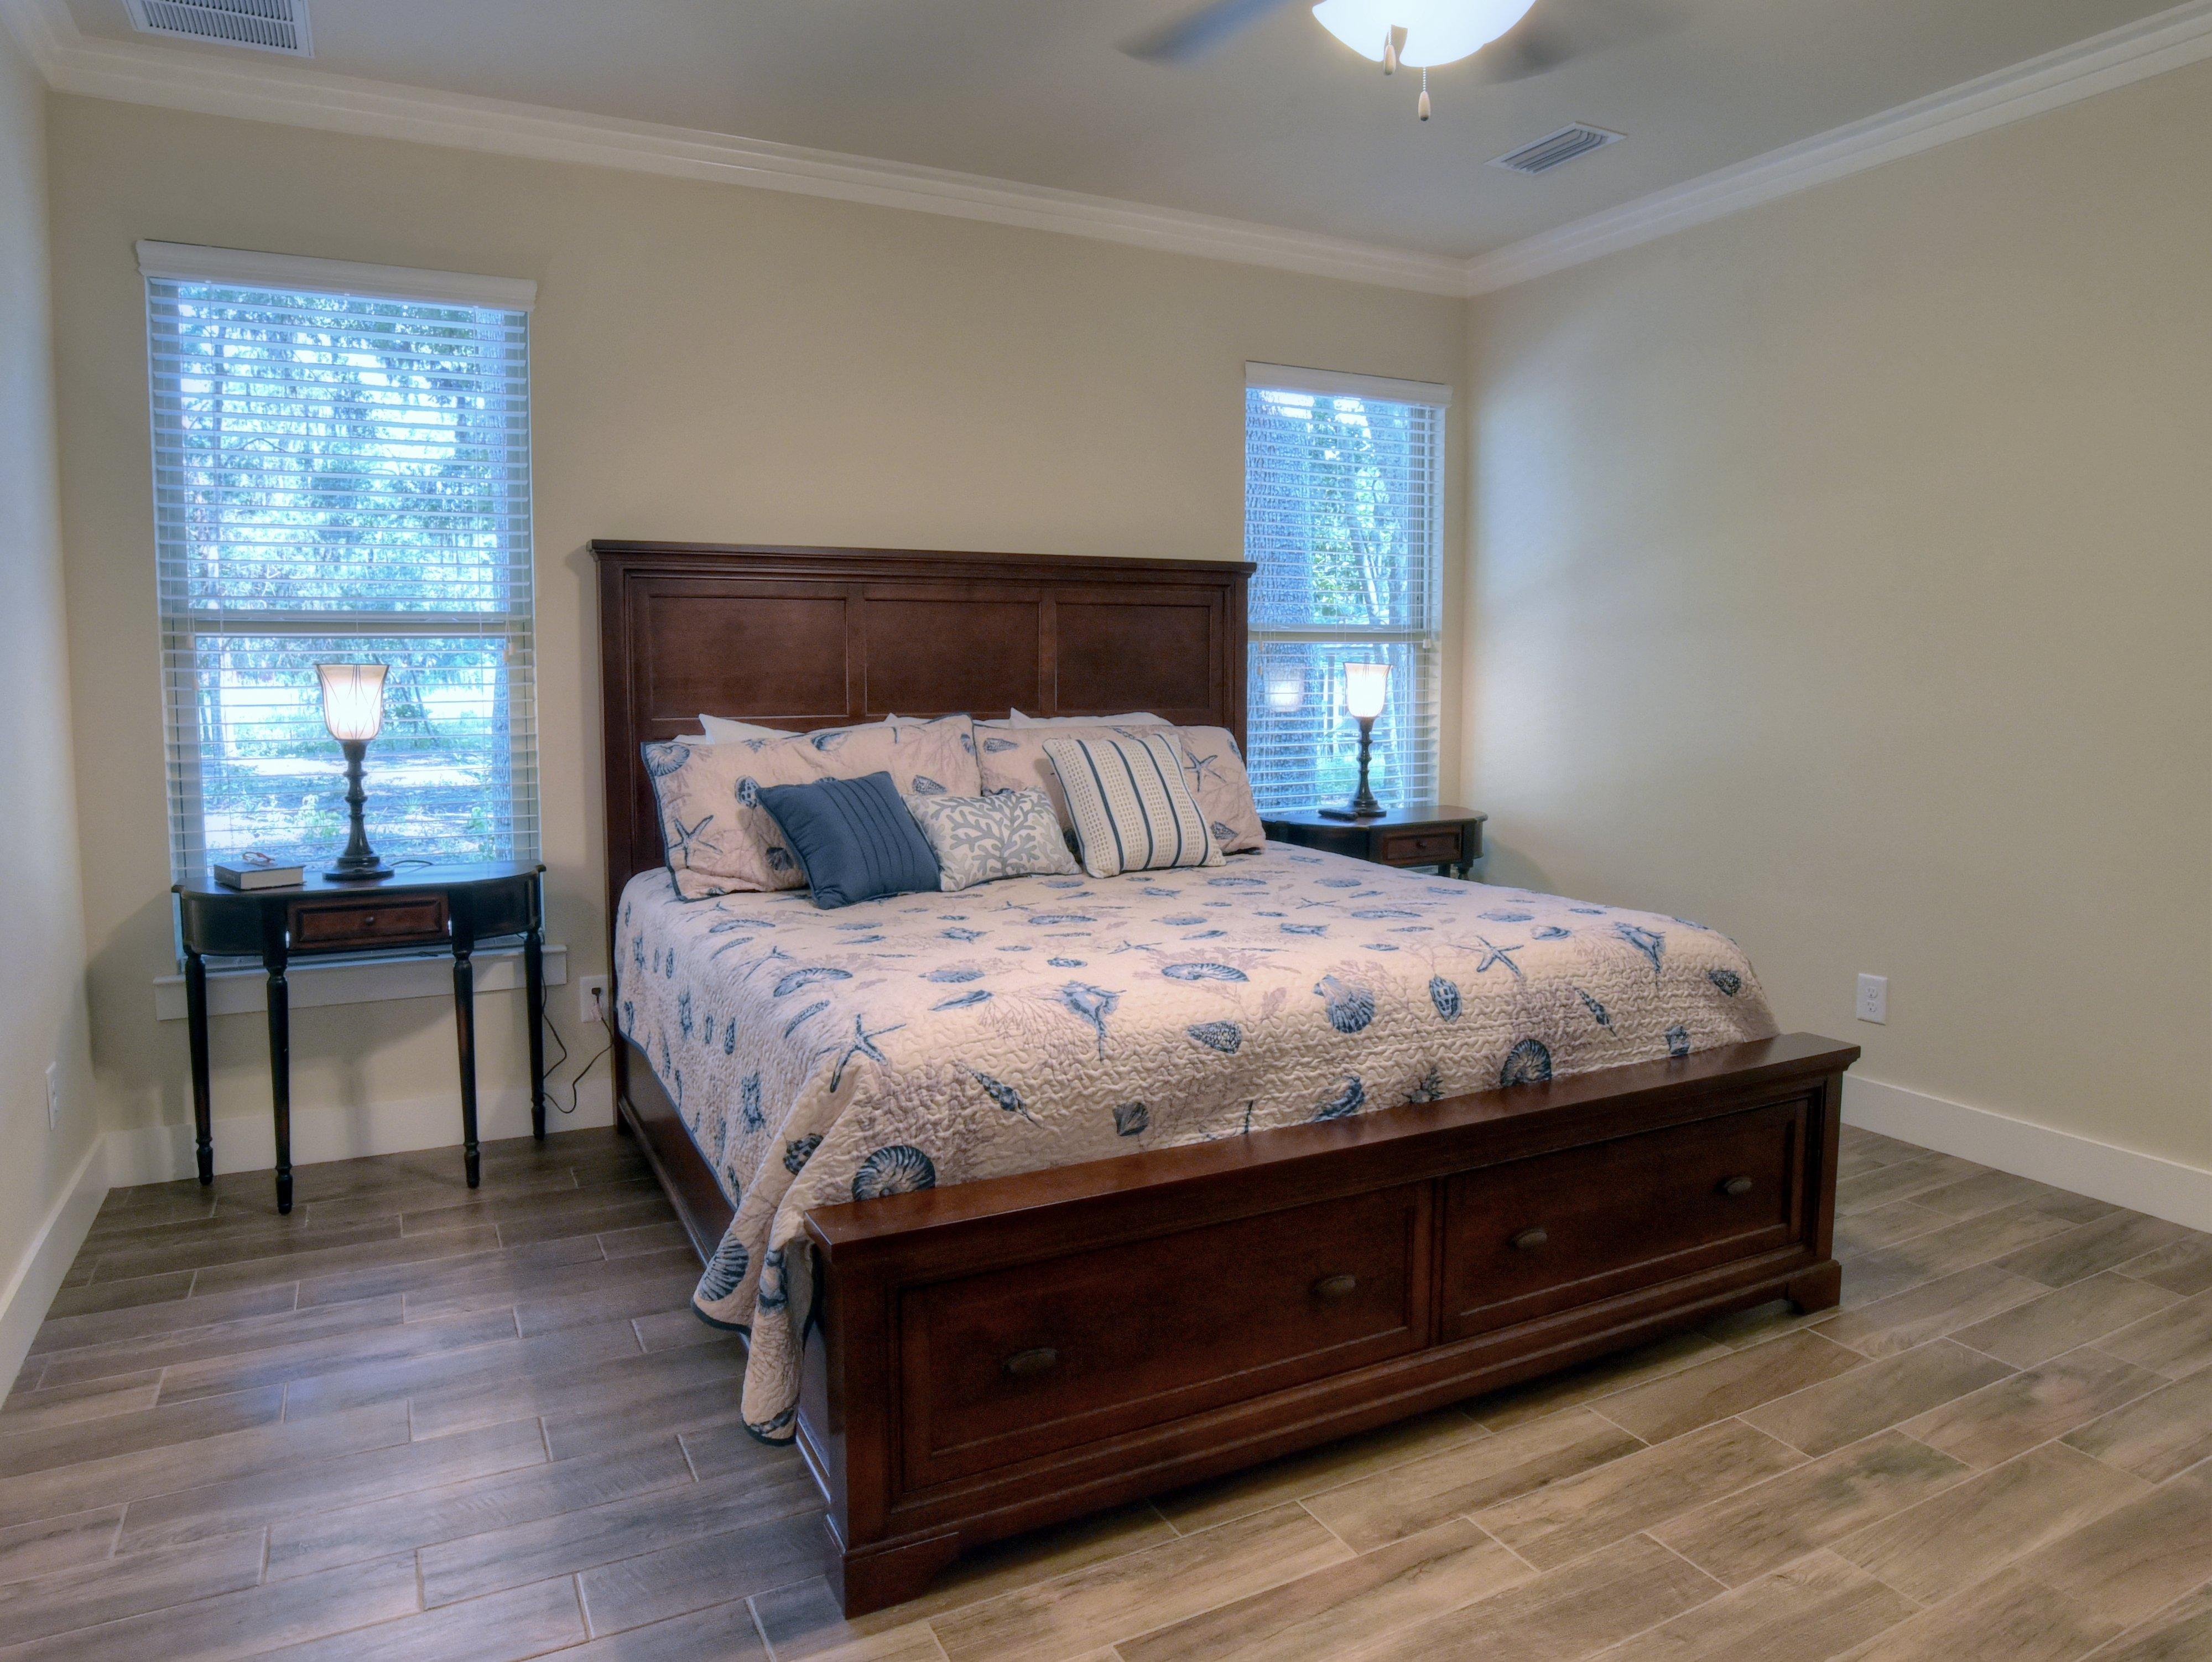 93 Beacon Point Condo rental in Sandestin Rentals ~ Cottages and Villas  in Destin Florida - #13